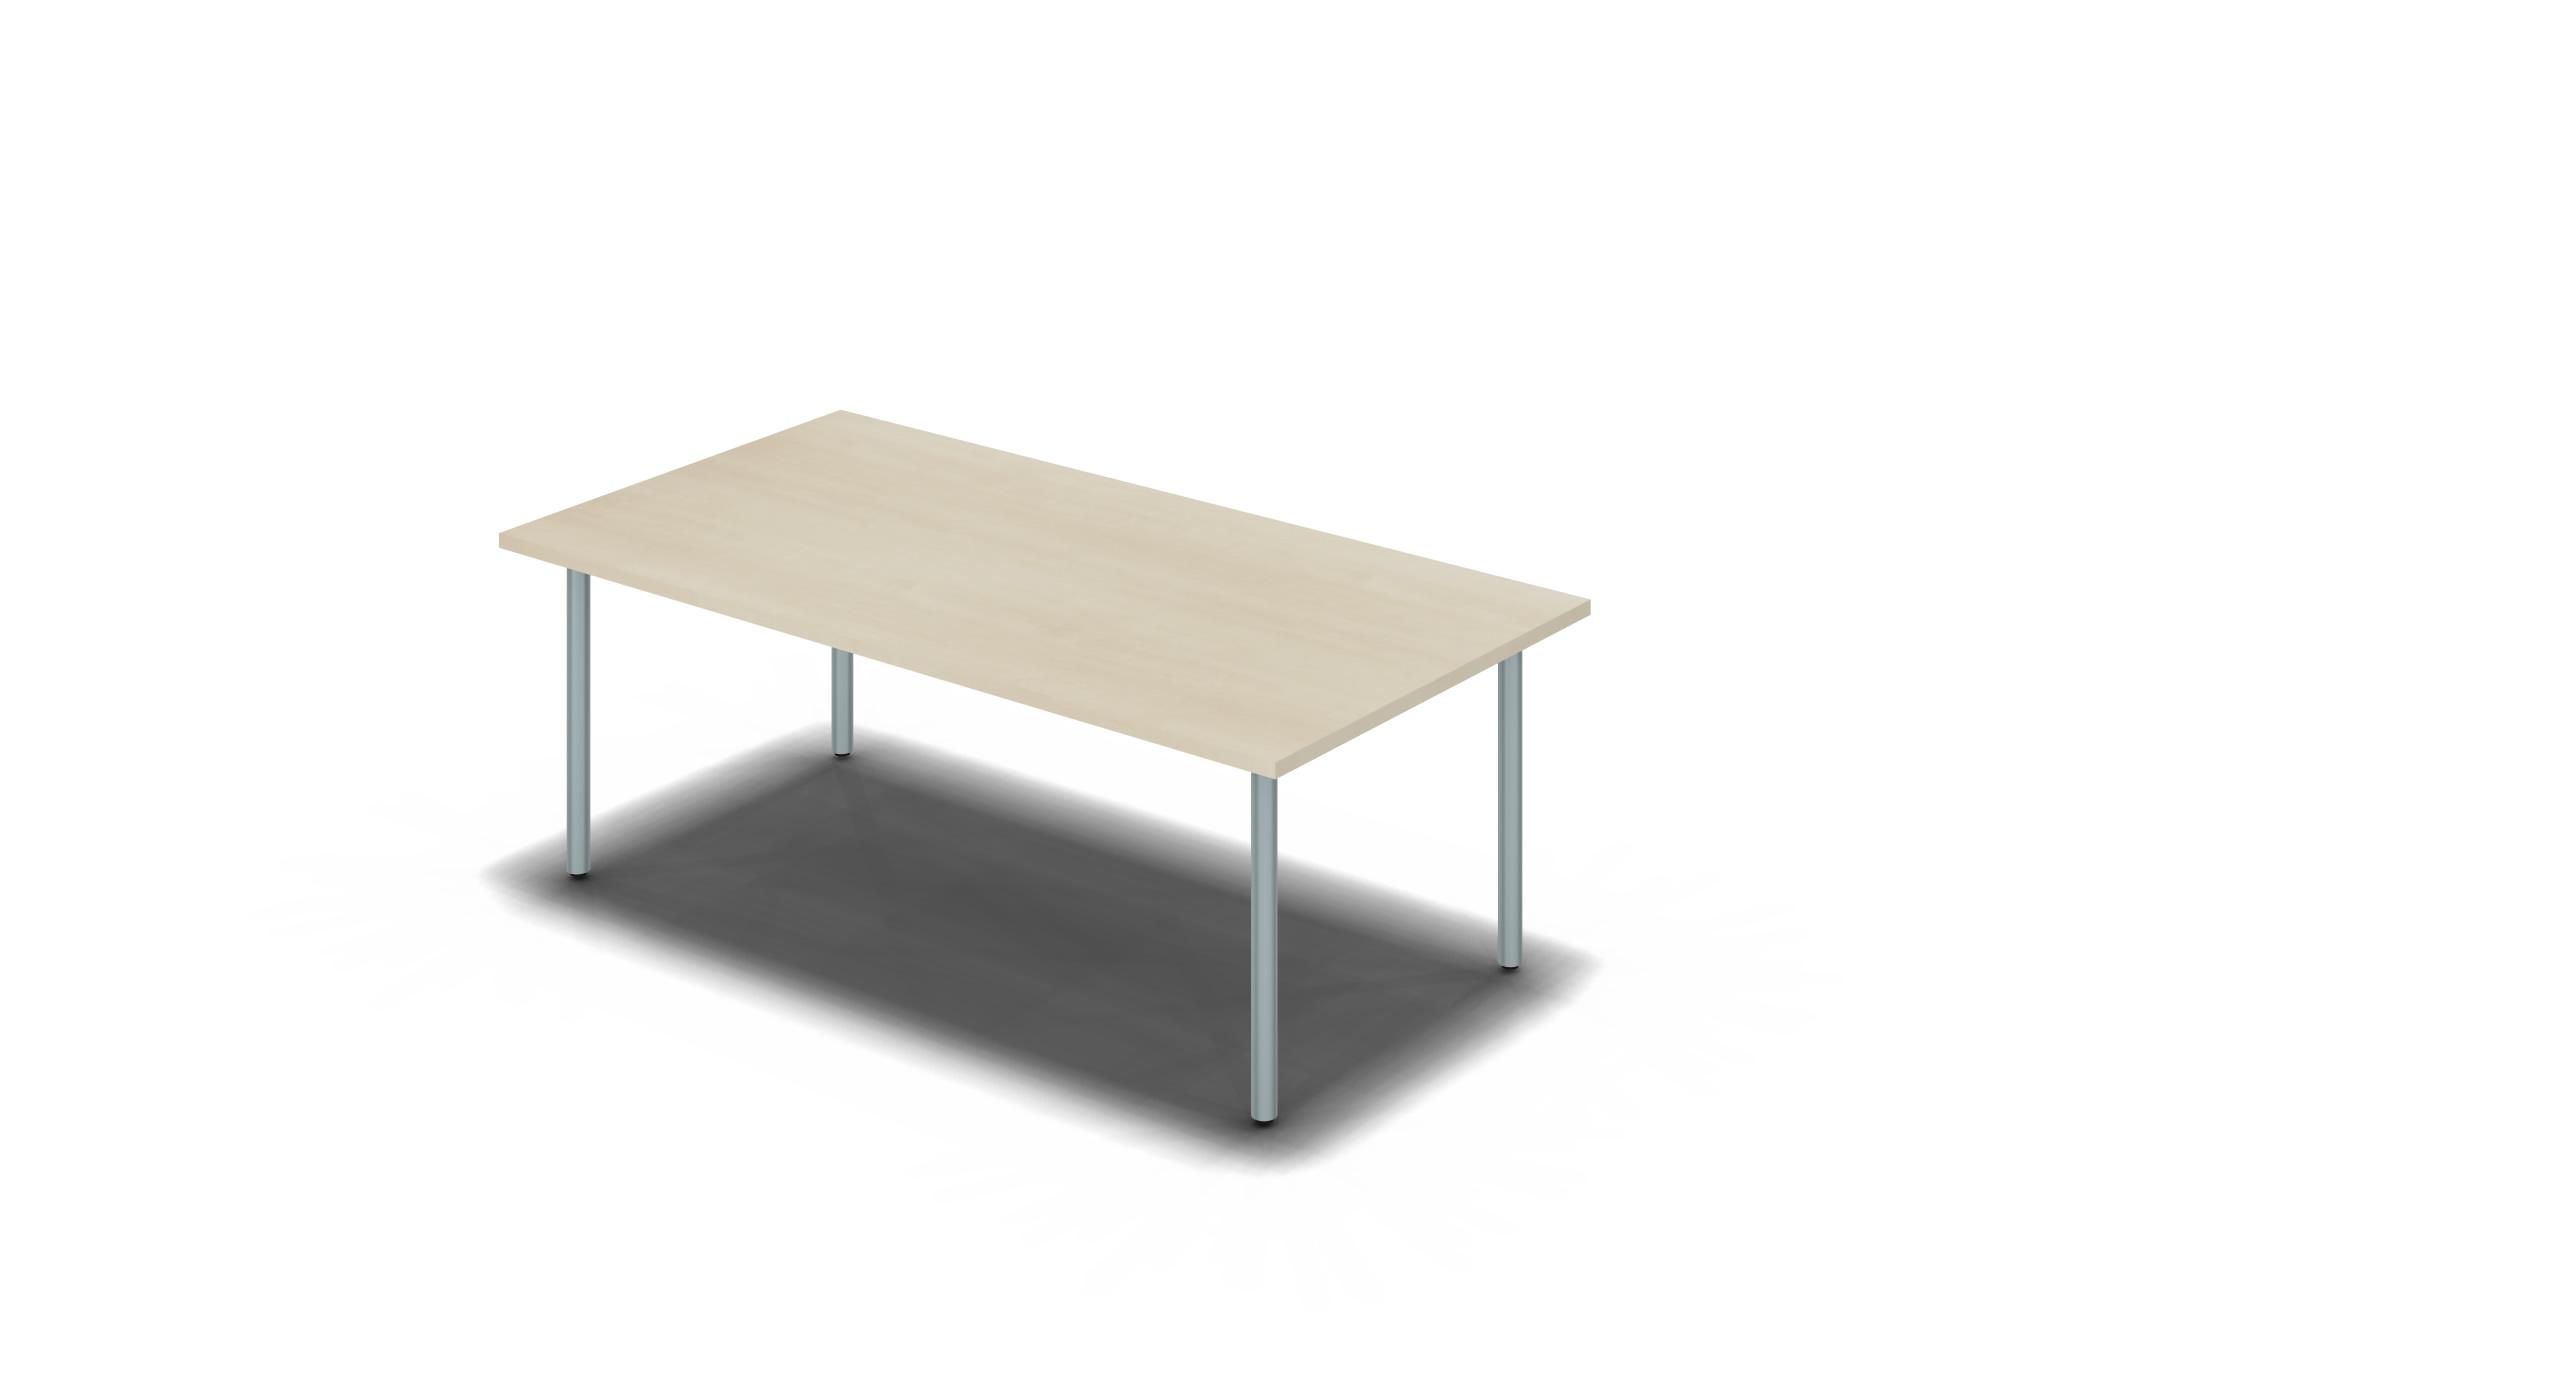 Table_Round_1800x900_Silver_Maple_noOption